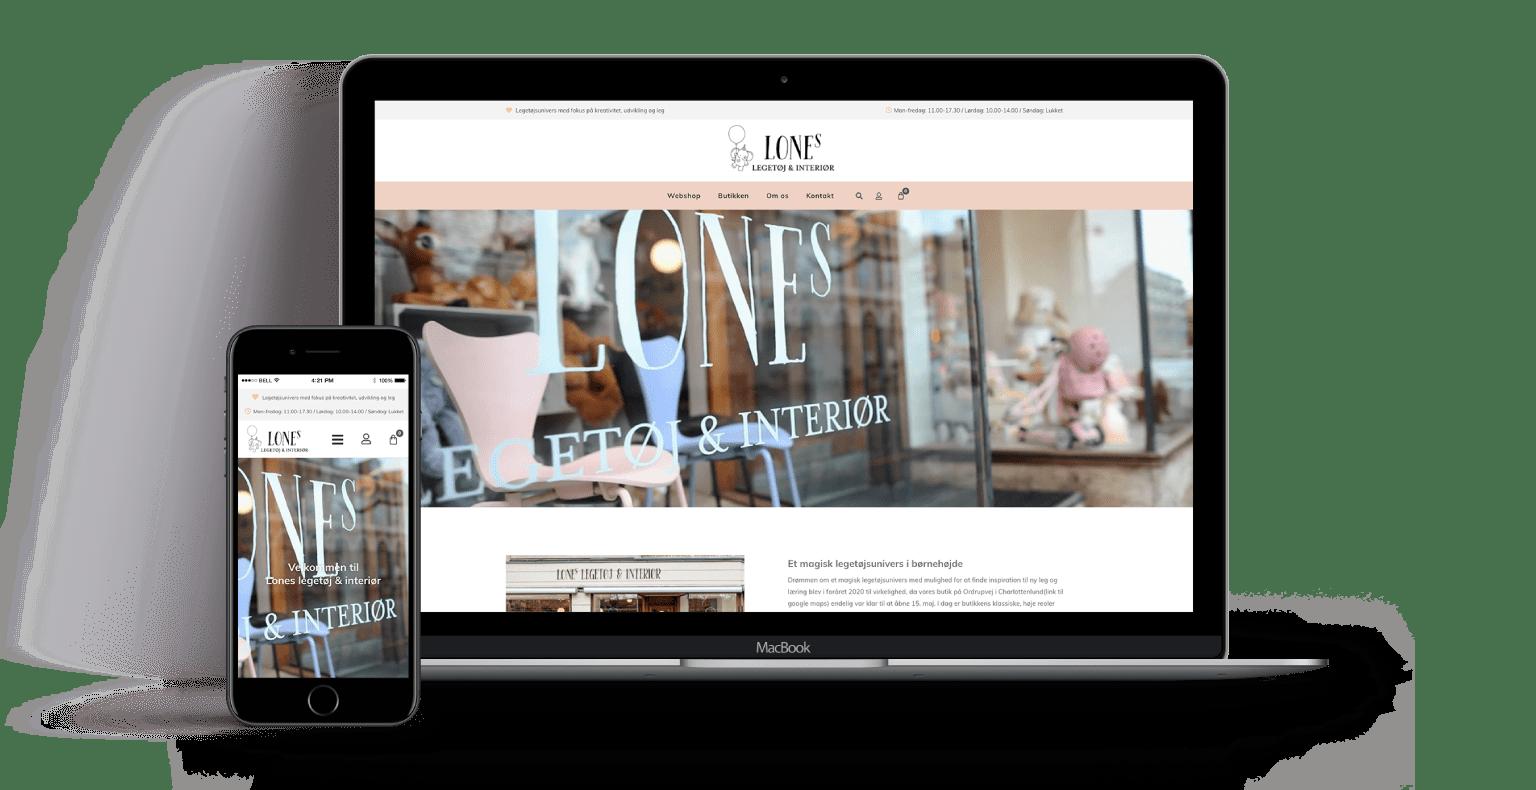 webdesign lones-legetoej